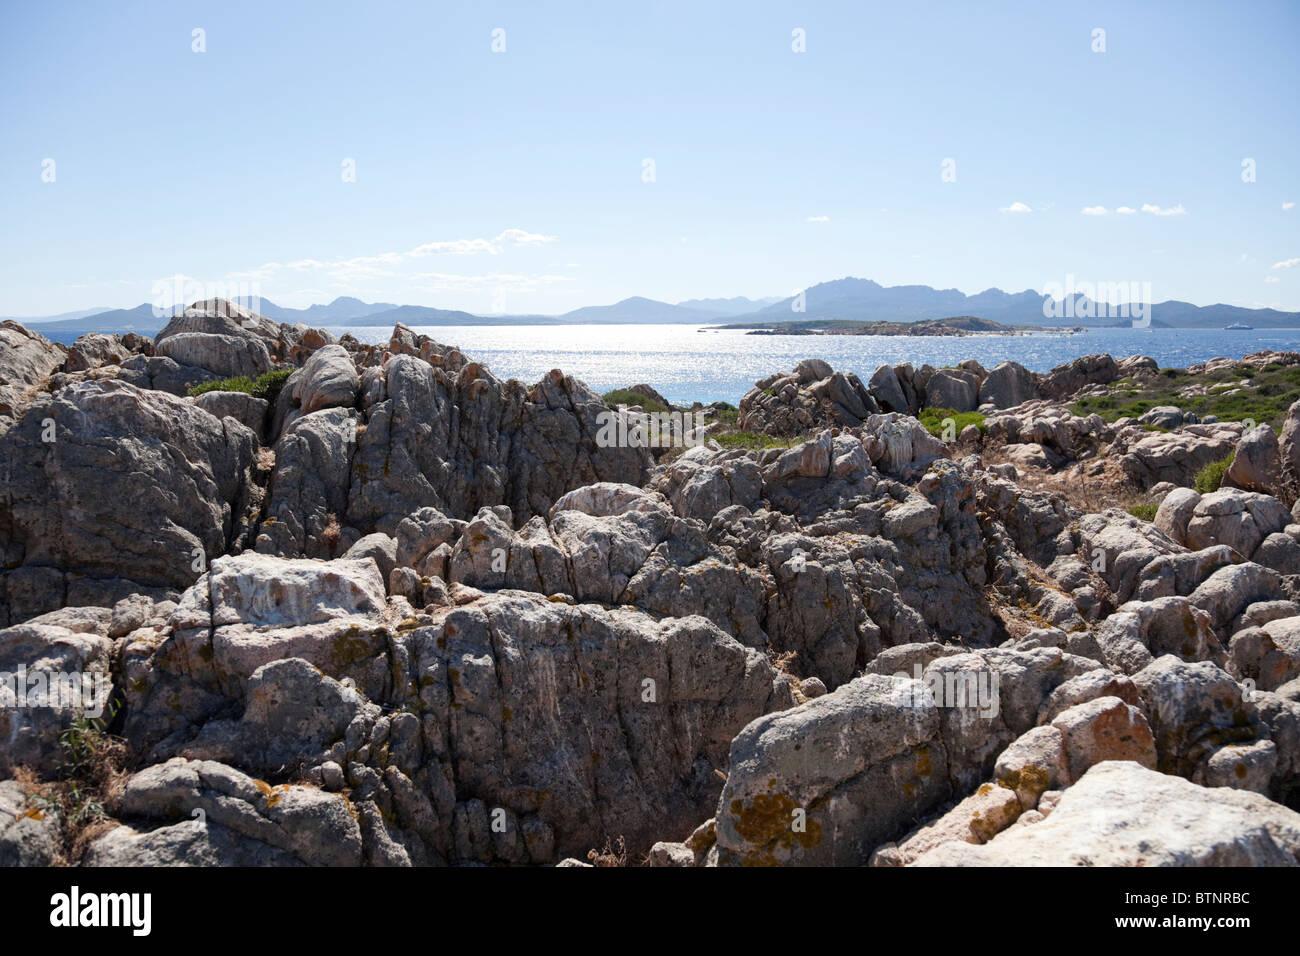 The geological feature of northern Sardinia, massive granite rocks. - Stock Image